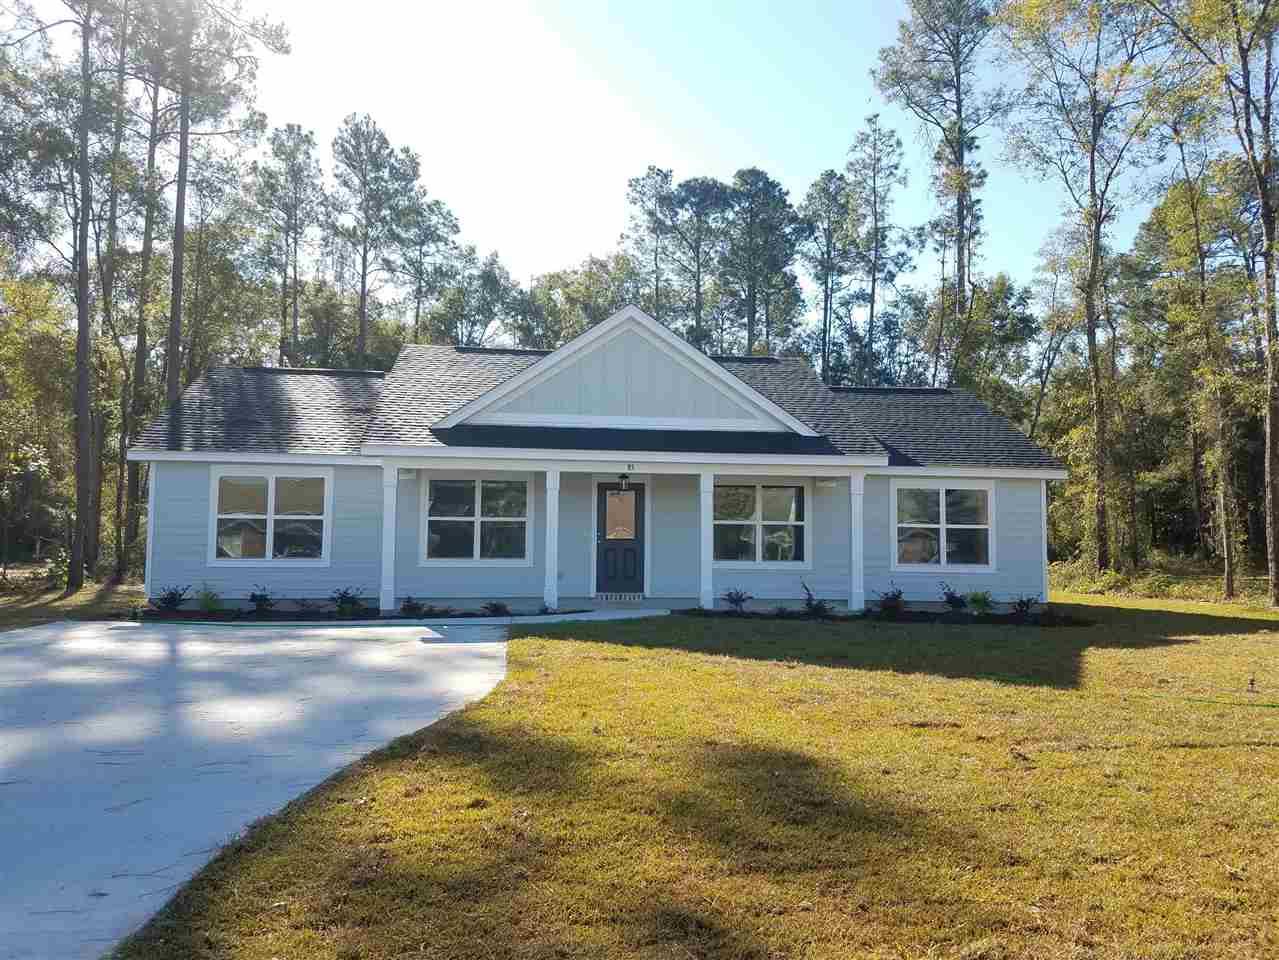 30 Lee, CRAWFORDVILLE, Florida 32327-0000, 4 Bedrooms Bedrooms, ,2 BathroomsBathrooms,Single Family,For Sale,30 Lee,1,325555